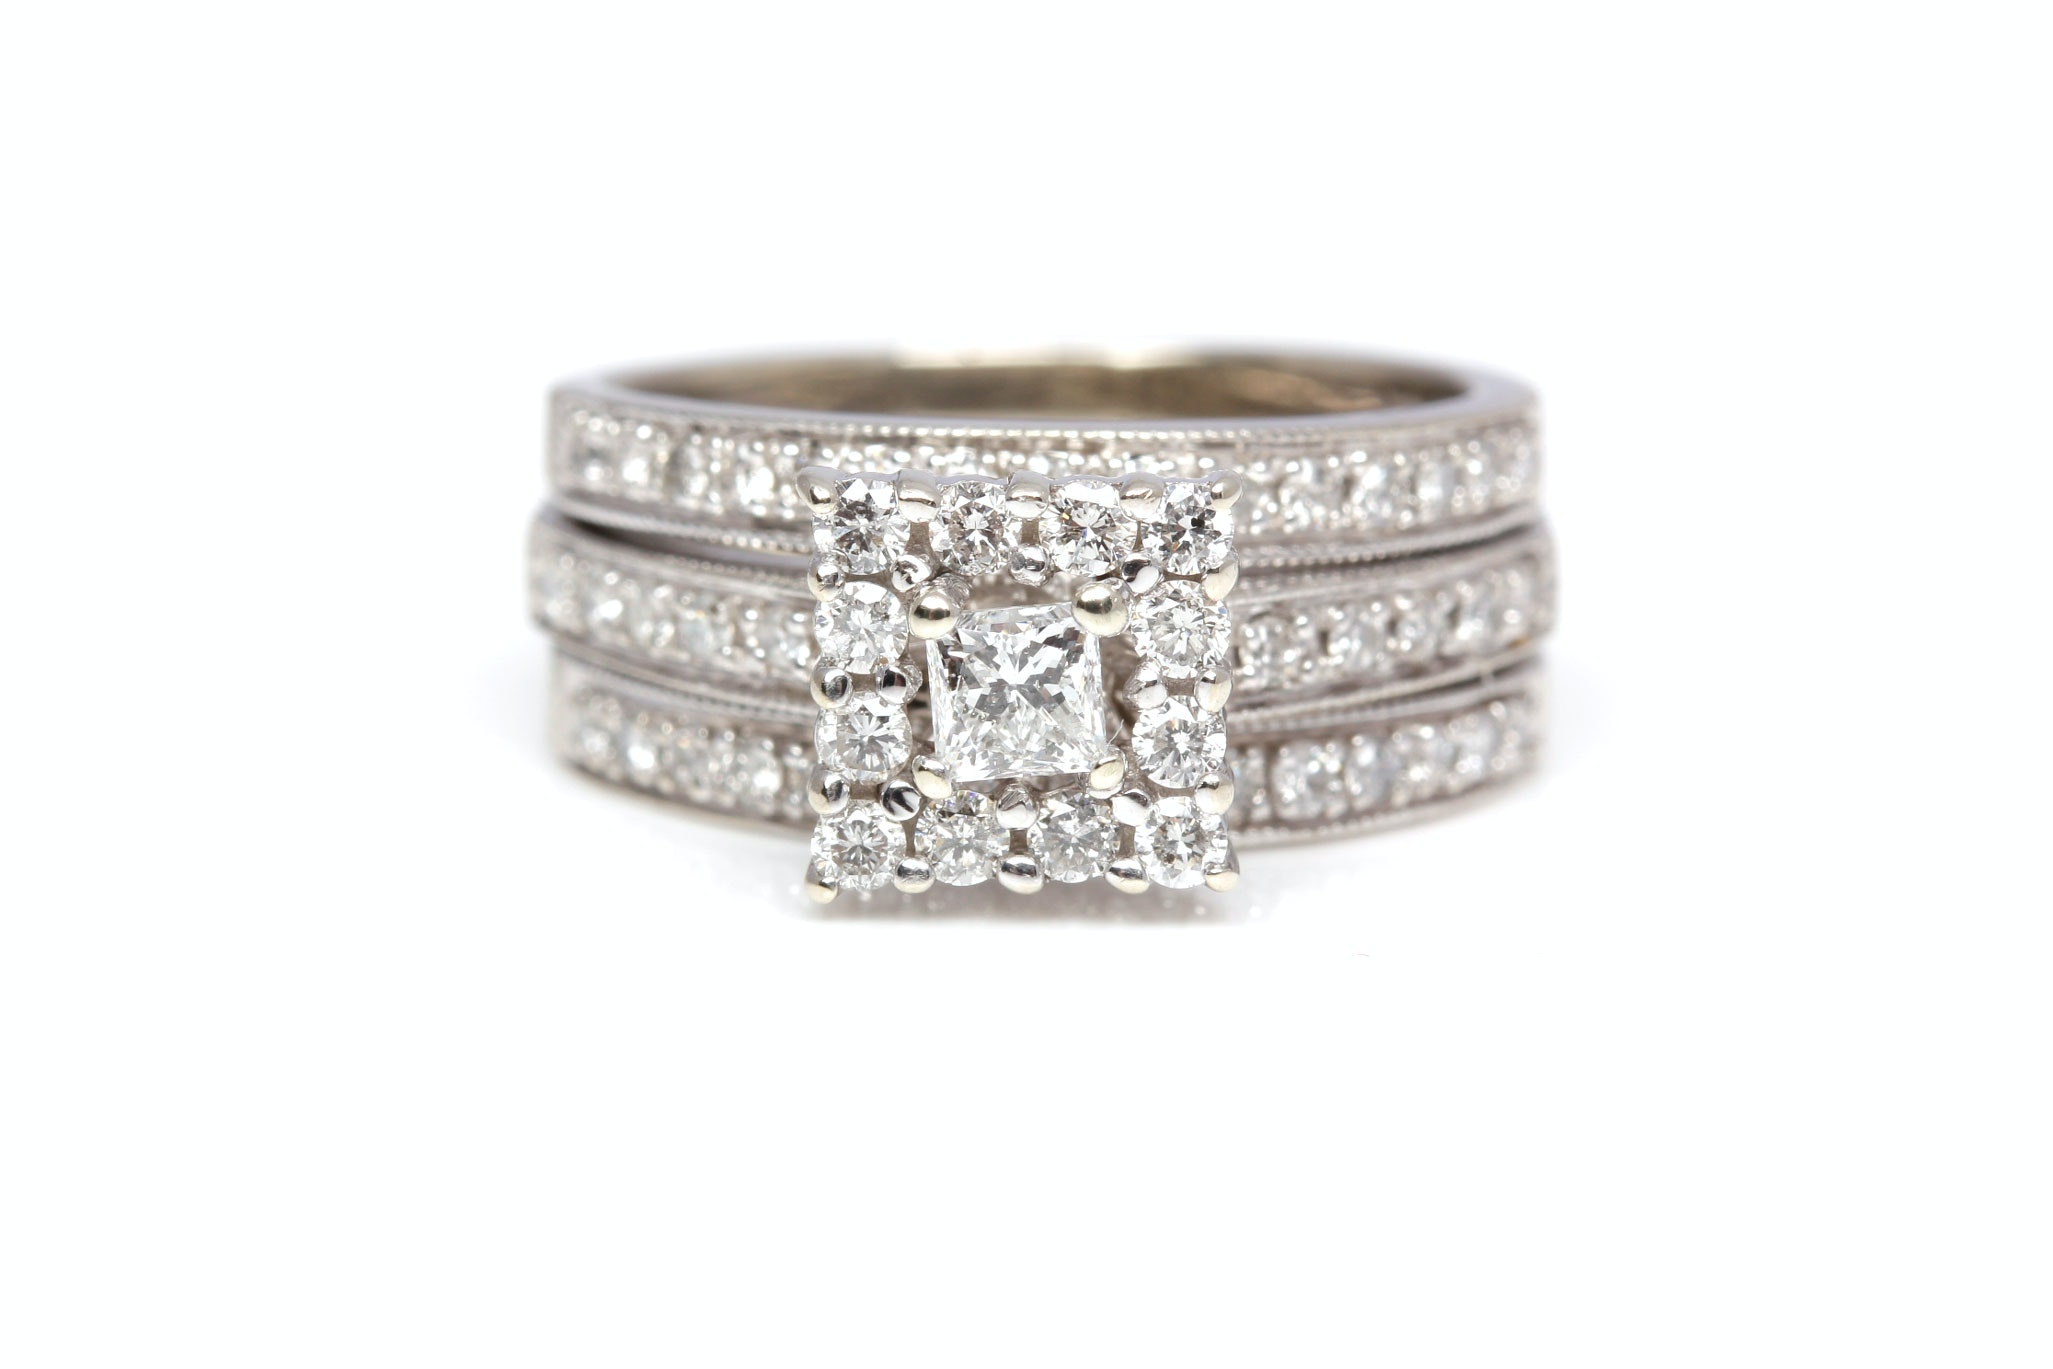 14K White Gold 1.00 CTW Diamond Ring